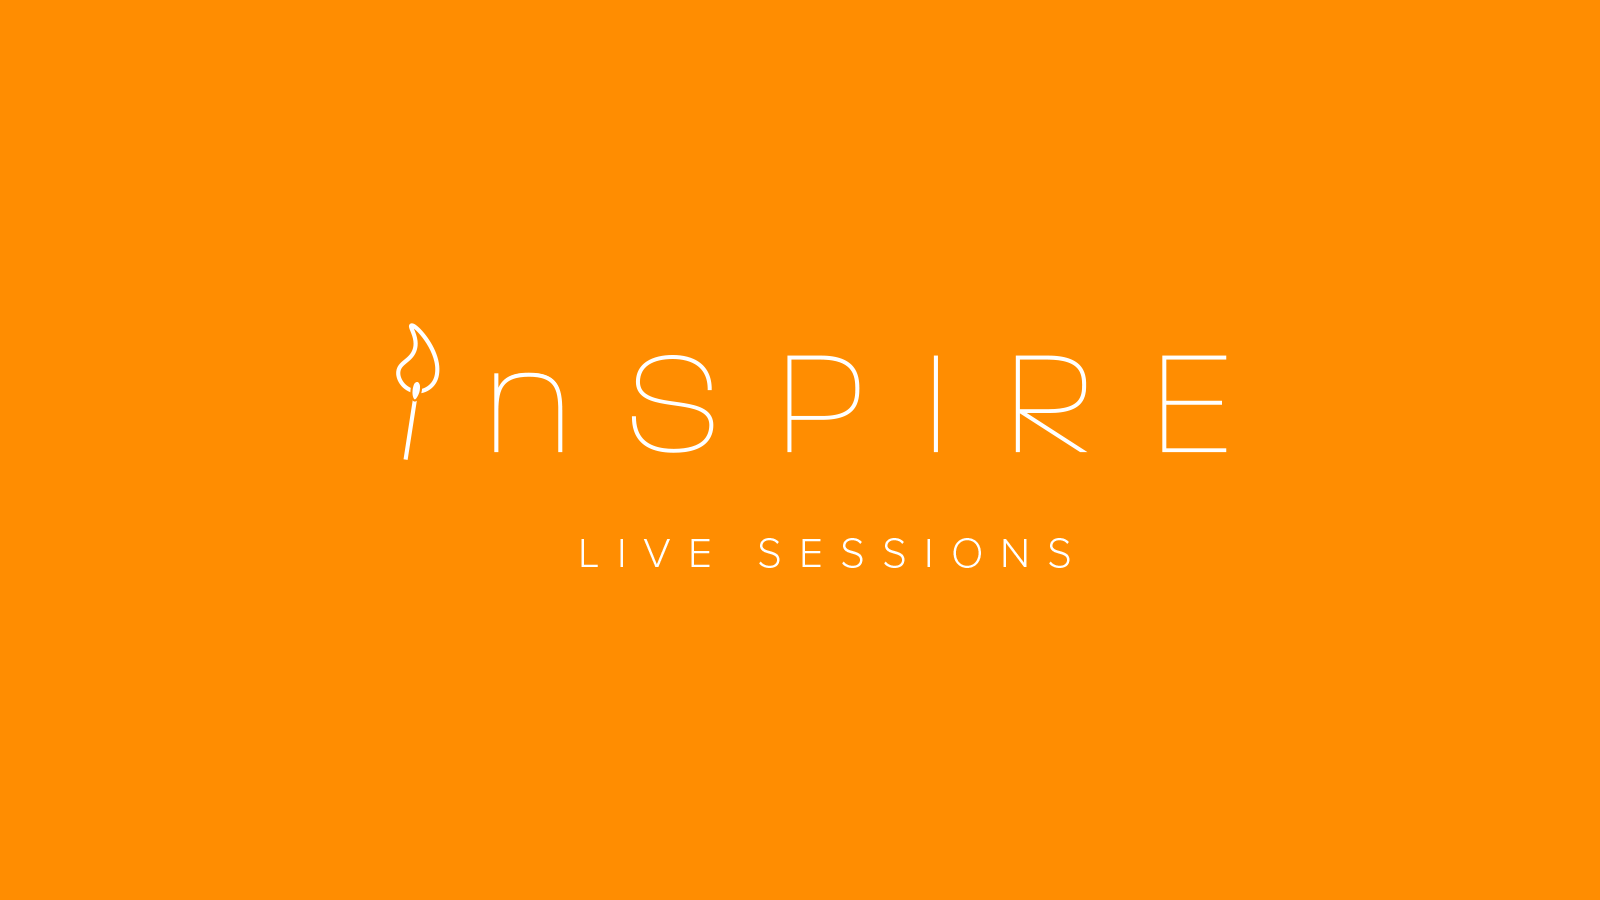 inspire-logo-9